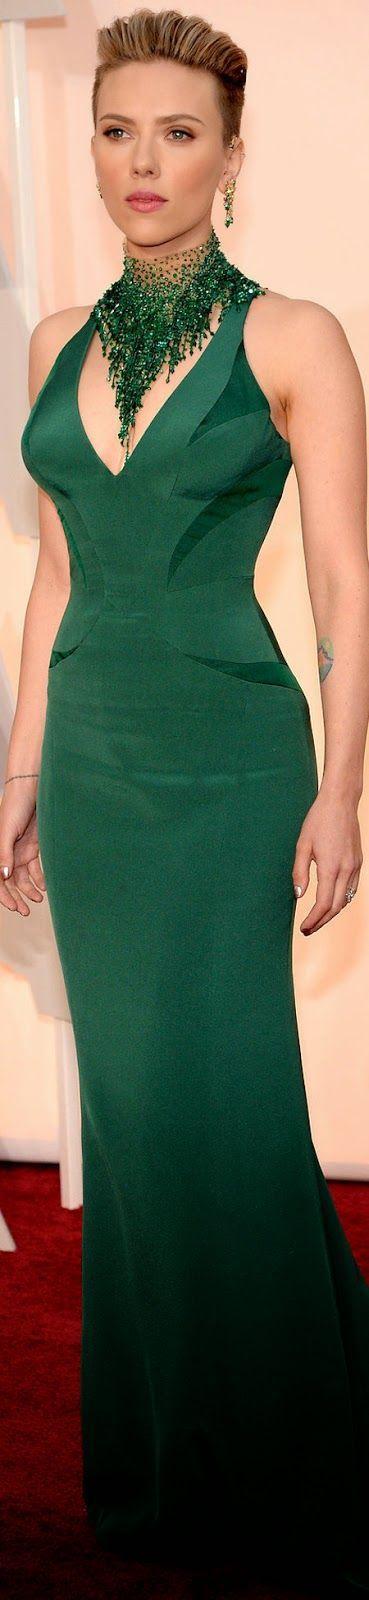 Hochzeit - LOOKandLOVEwithLOLO: 87th Academy Awards Red Carpet